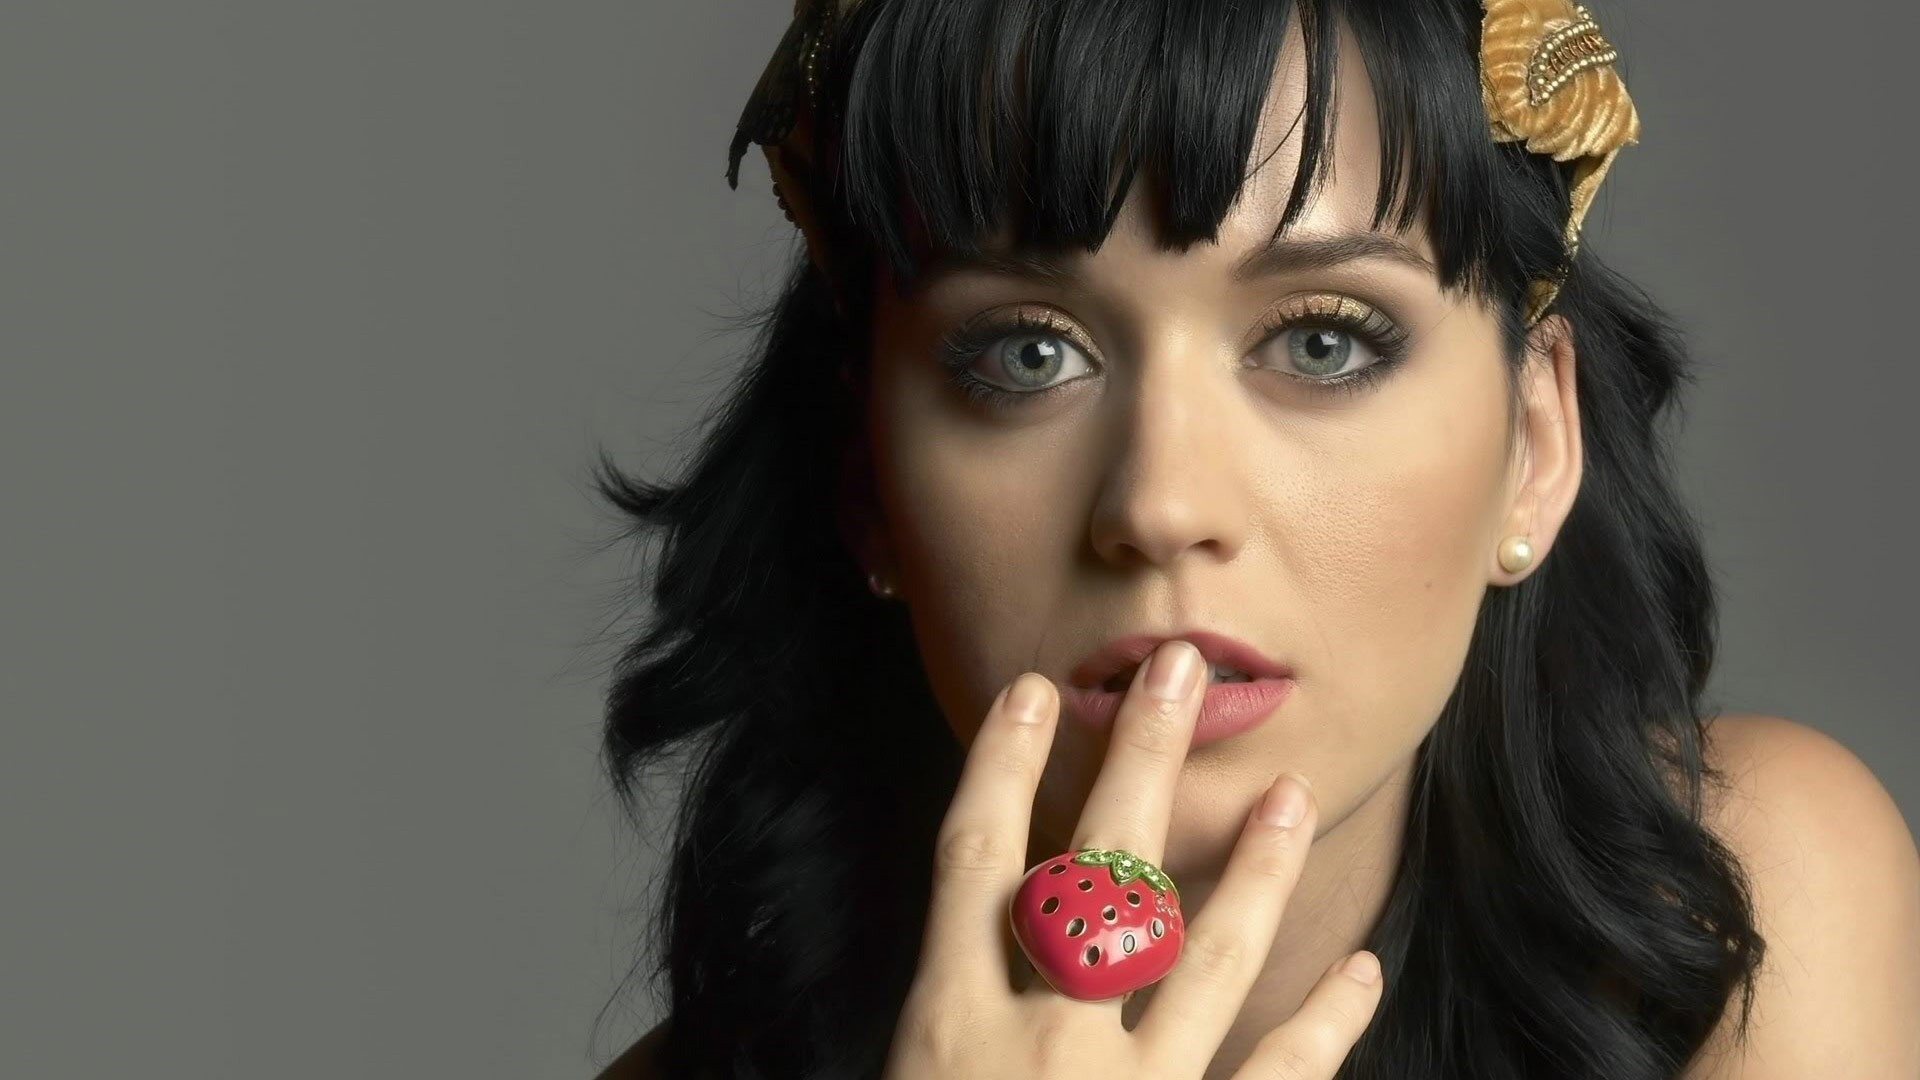 Katy Perry Celebrity HD Wallpaper 3